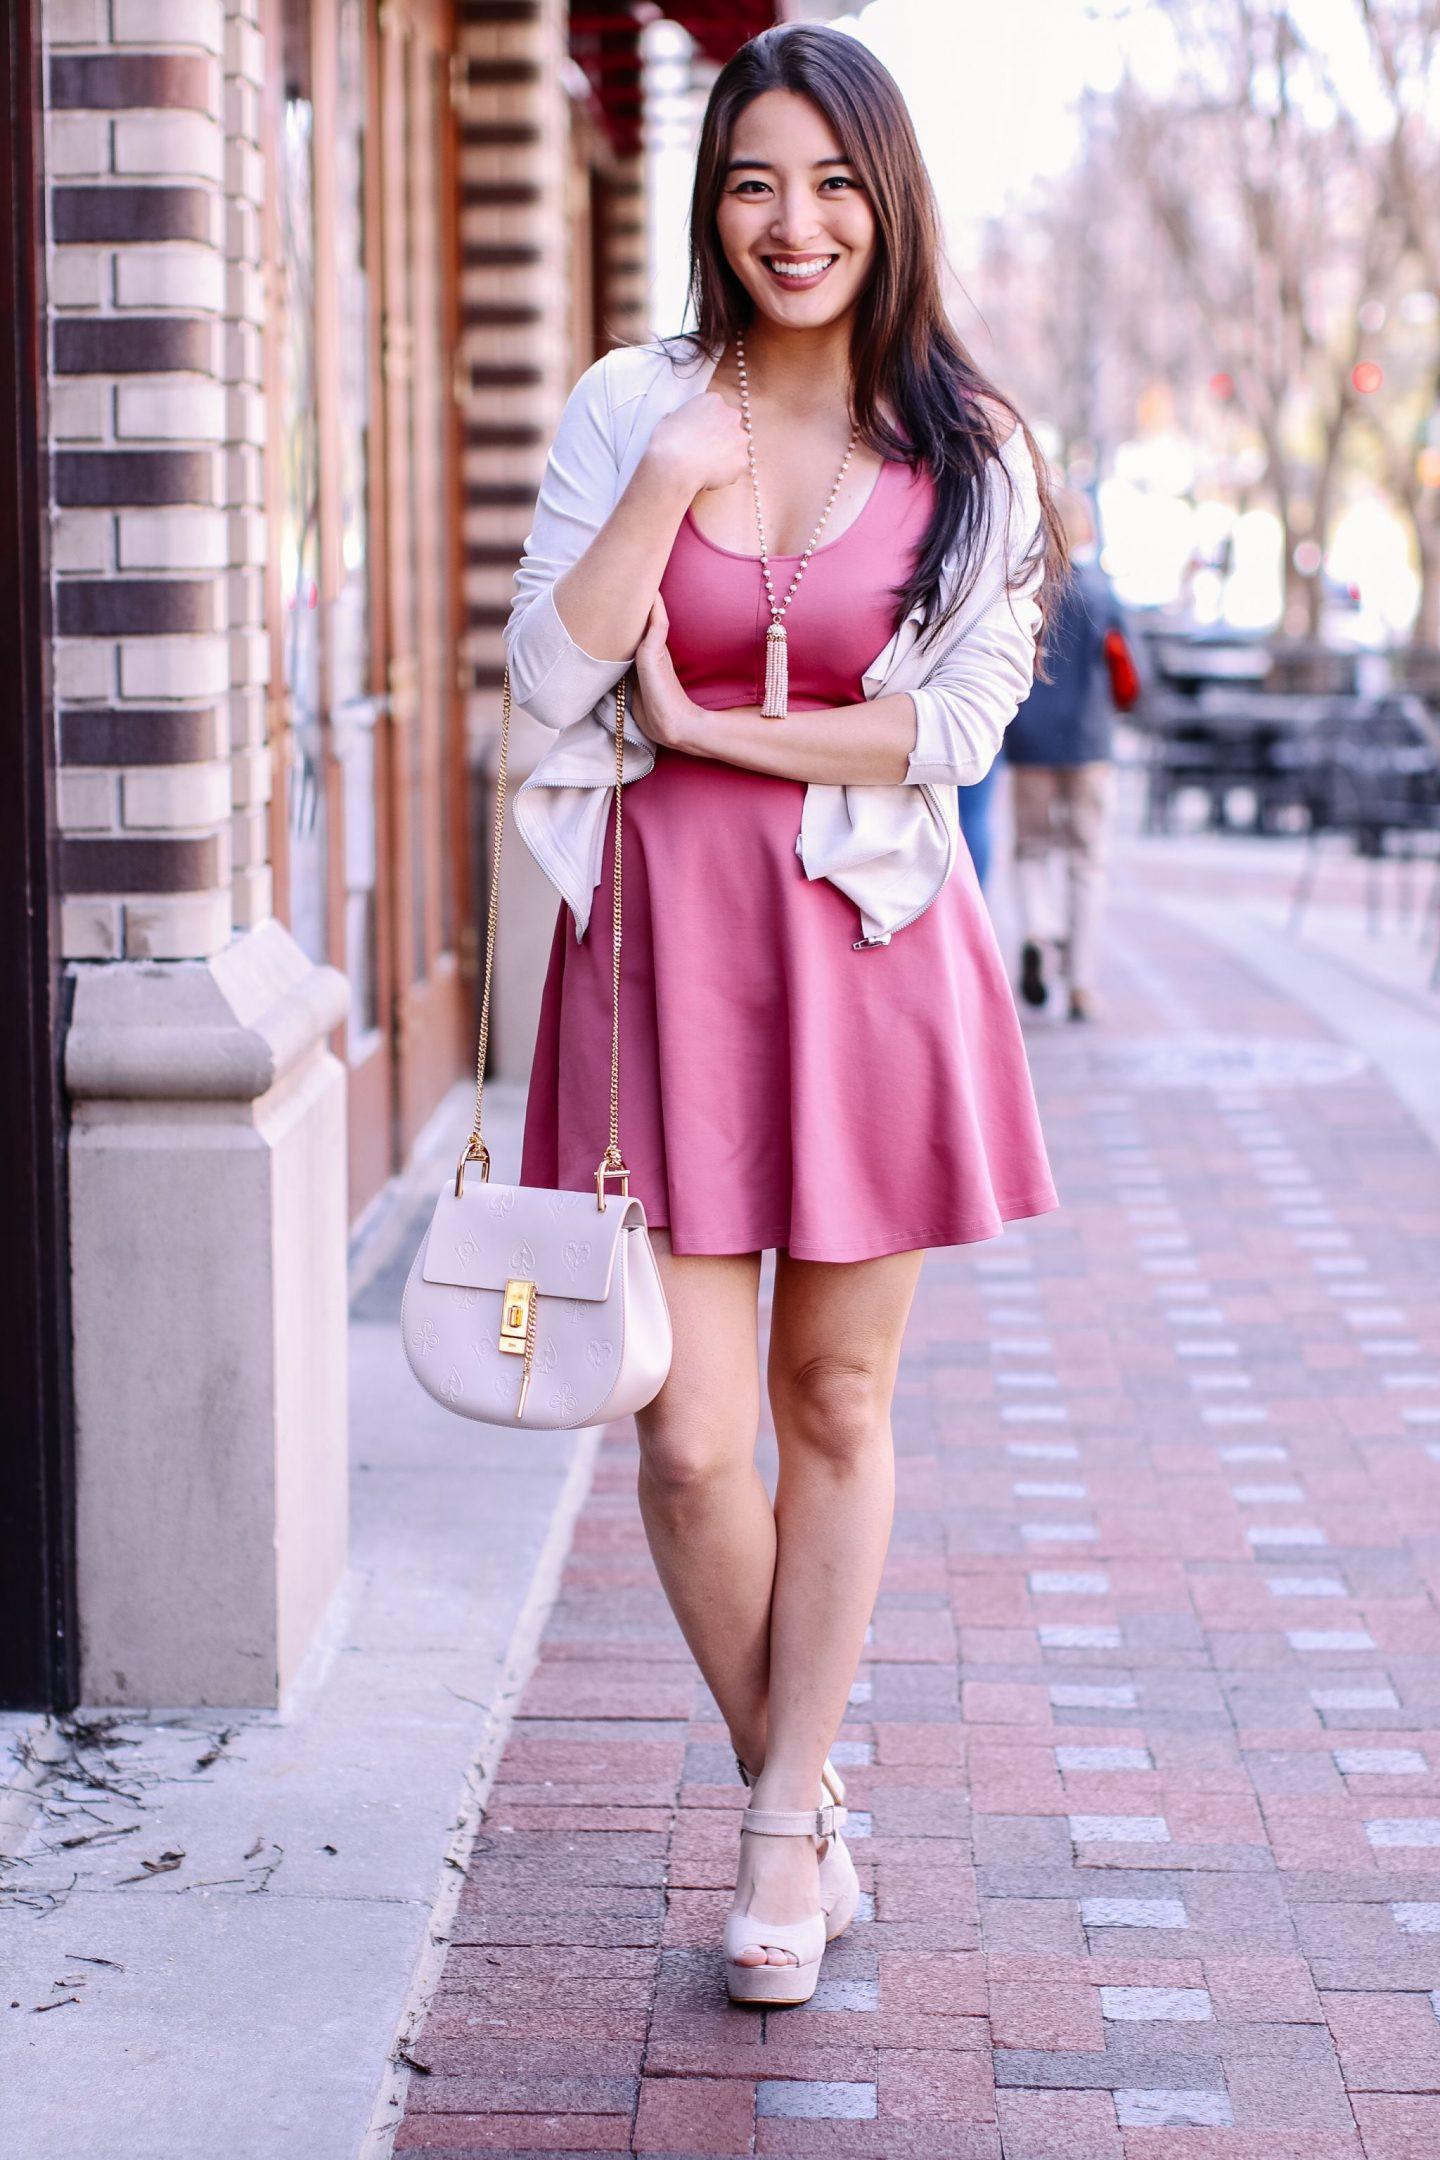 asian girl wears pink dress